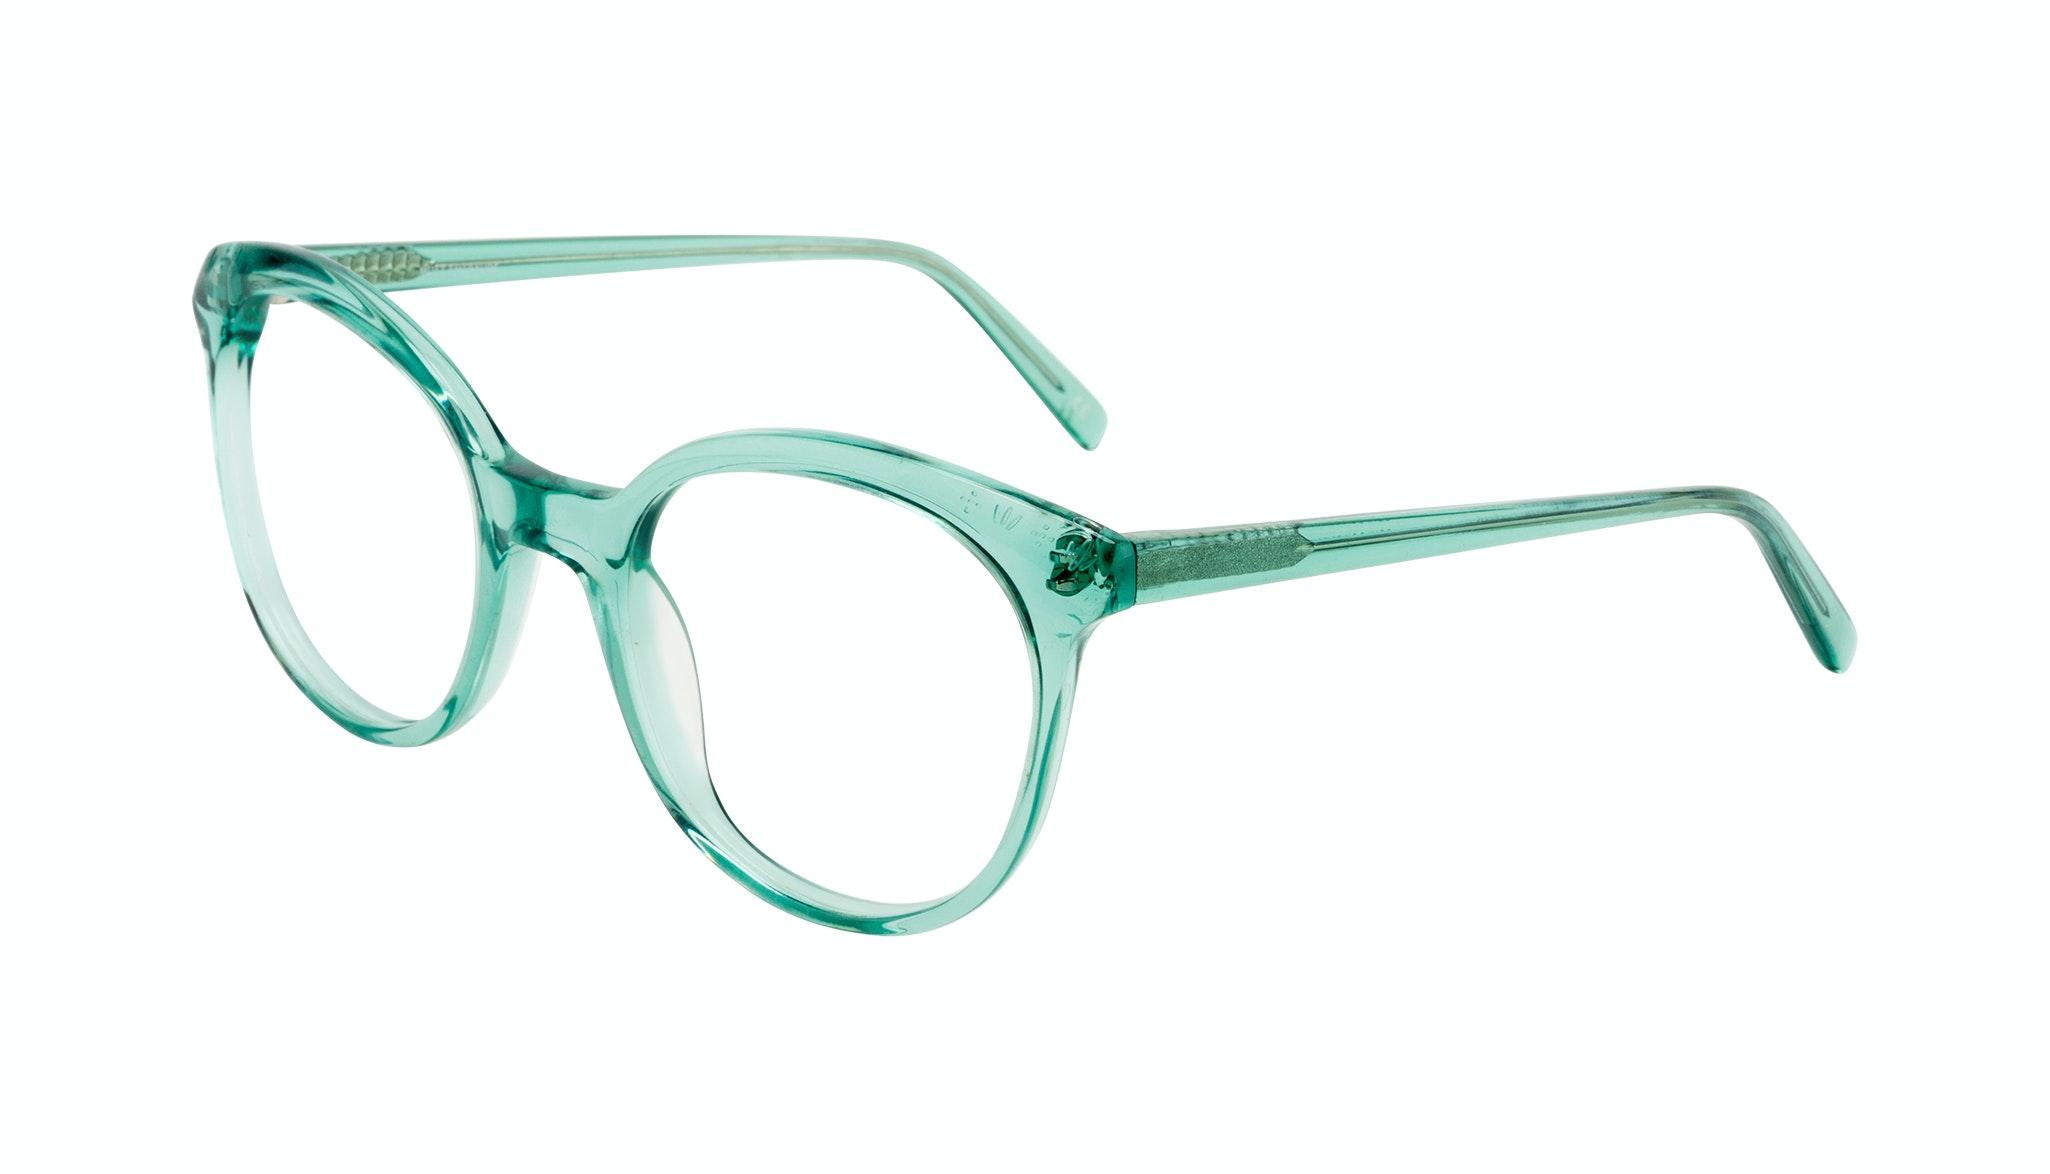 Affordable Fashion Glasses Round Eyeglasses Women Must Emeraude Tilt